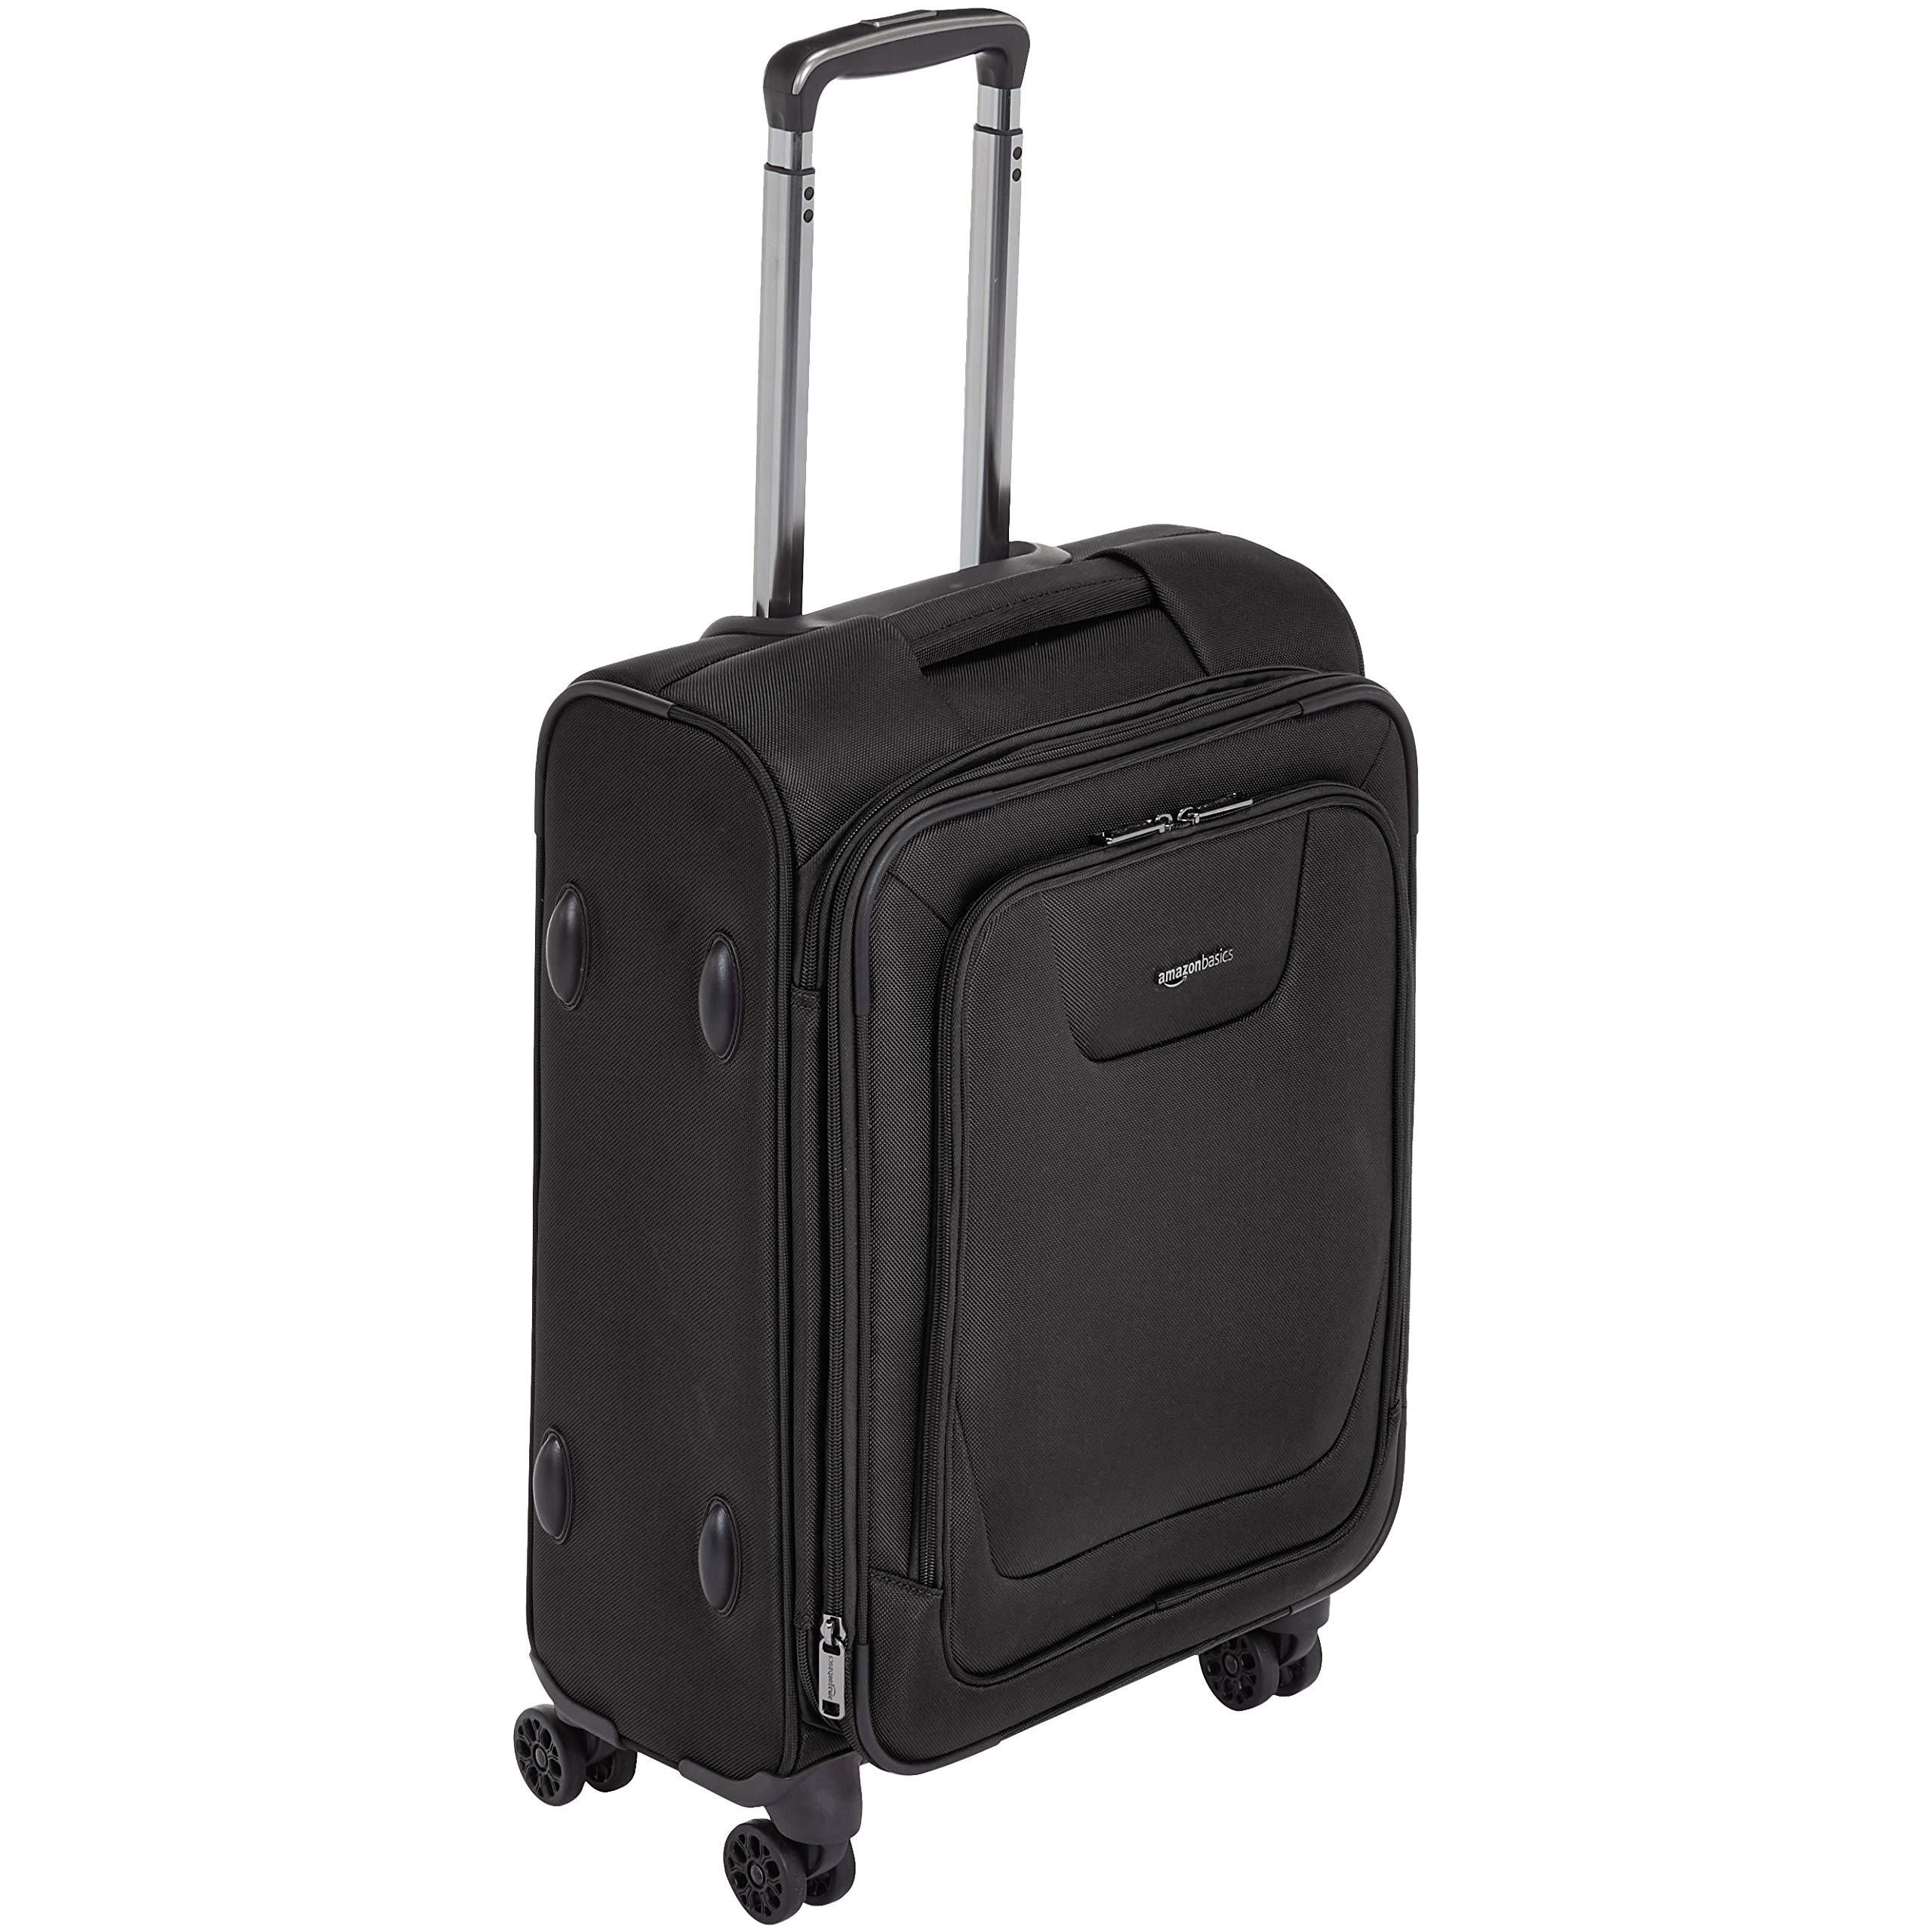 AmazonBasics Expandable Softside Carry-On Spinner Luggage Suitcase With TSA Lock And Wheels - 21 Inch, Black